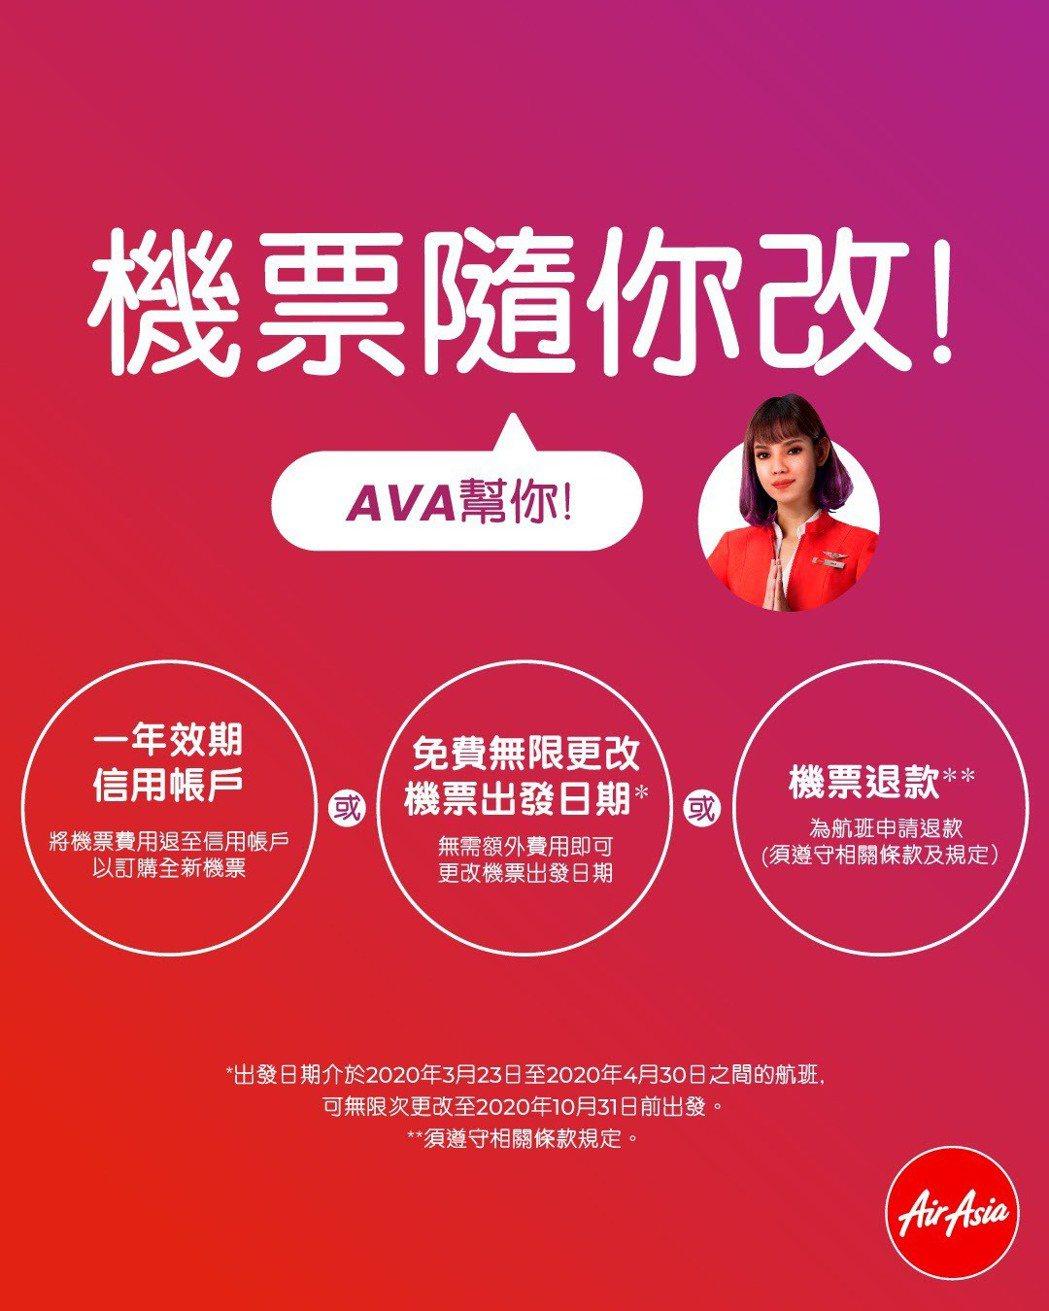 AirAsia今(23)日宣布,為所有於3月22日或之前所訂購的2020年4月3...